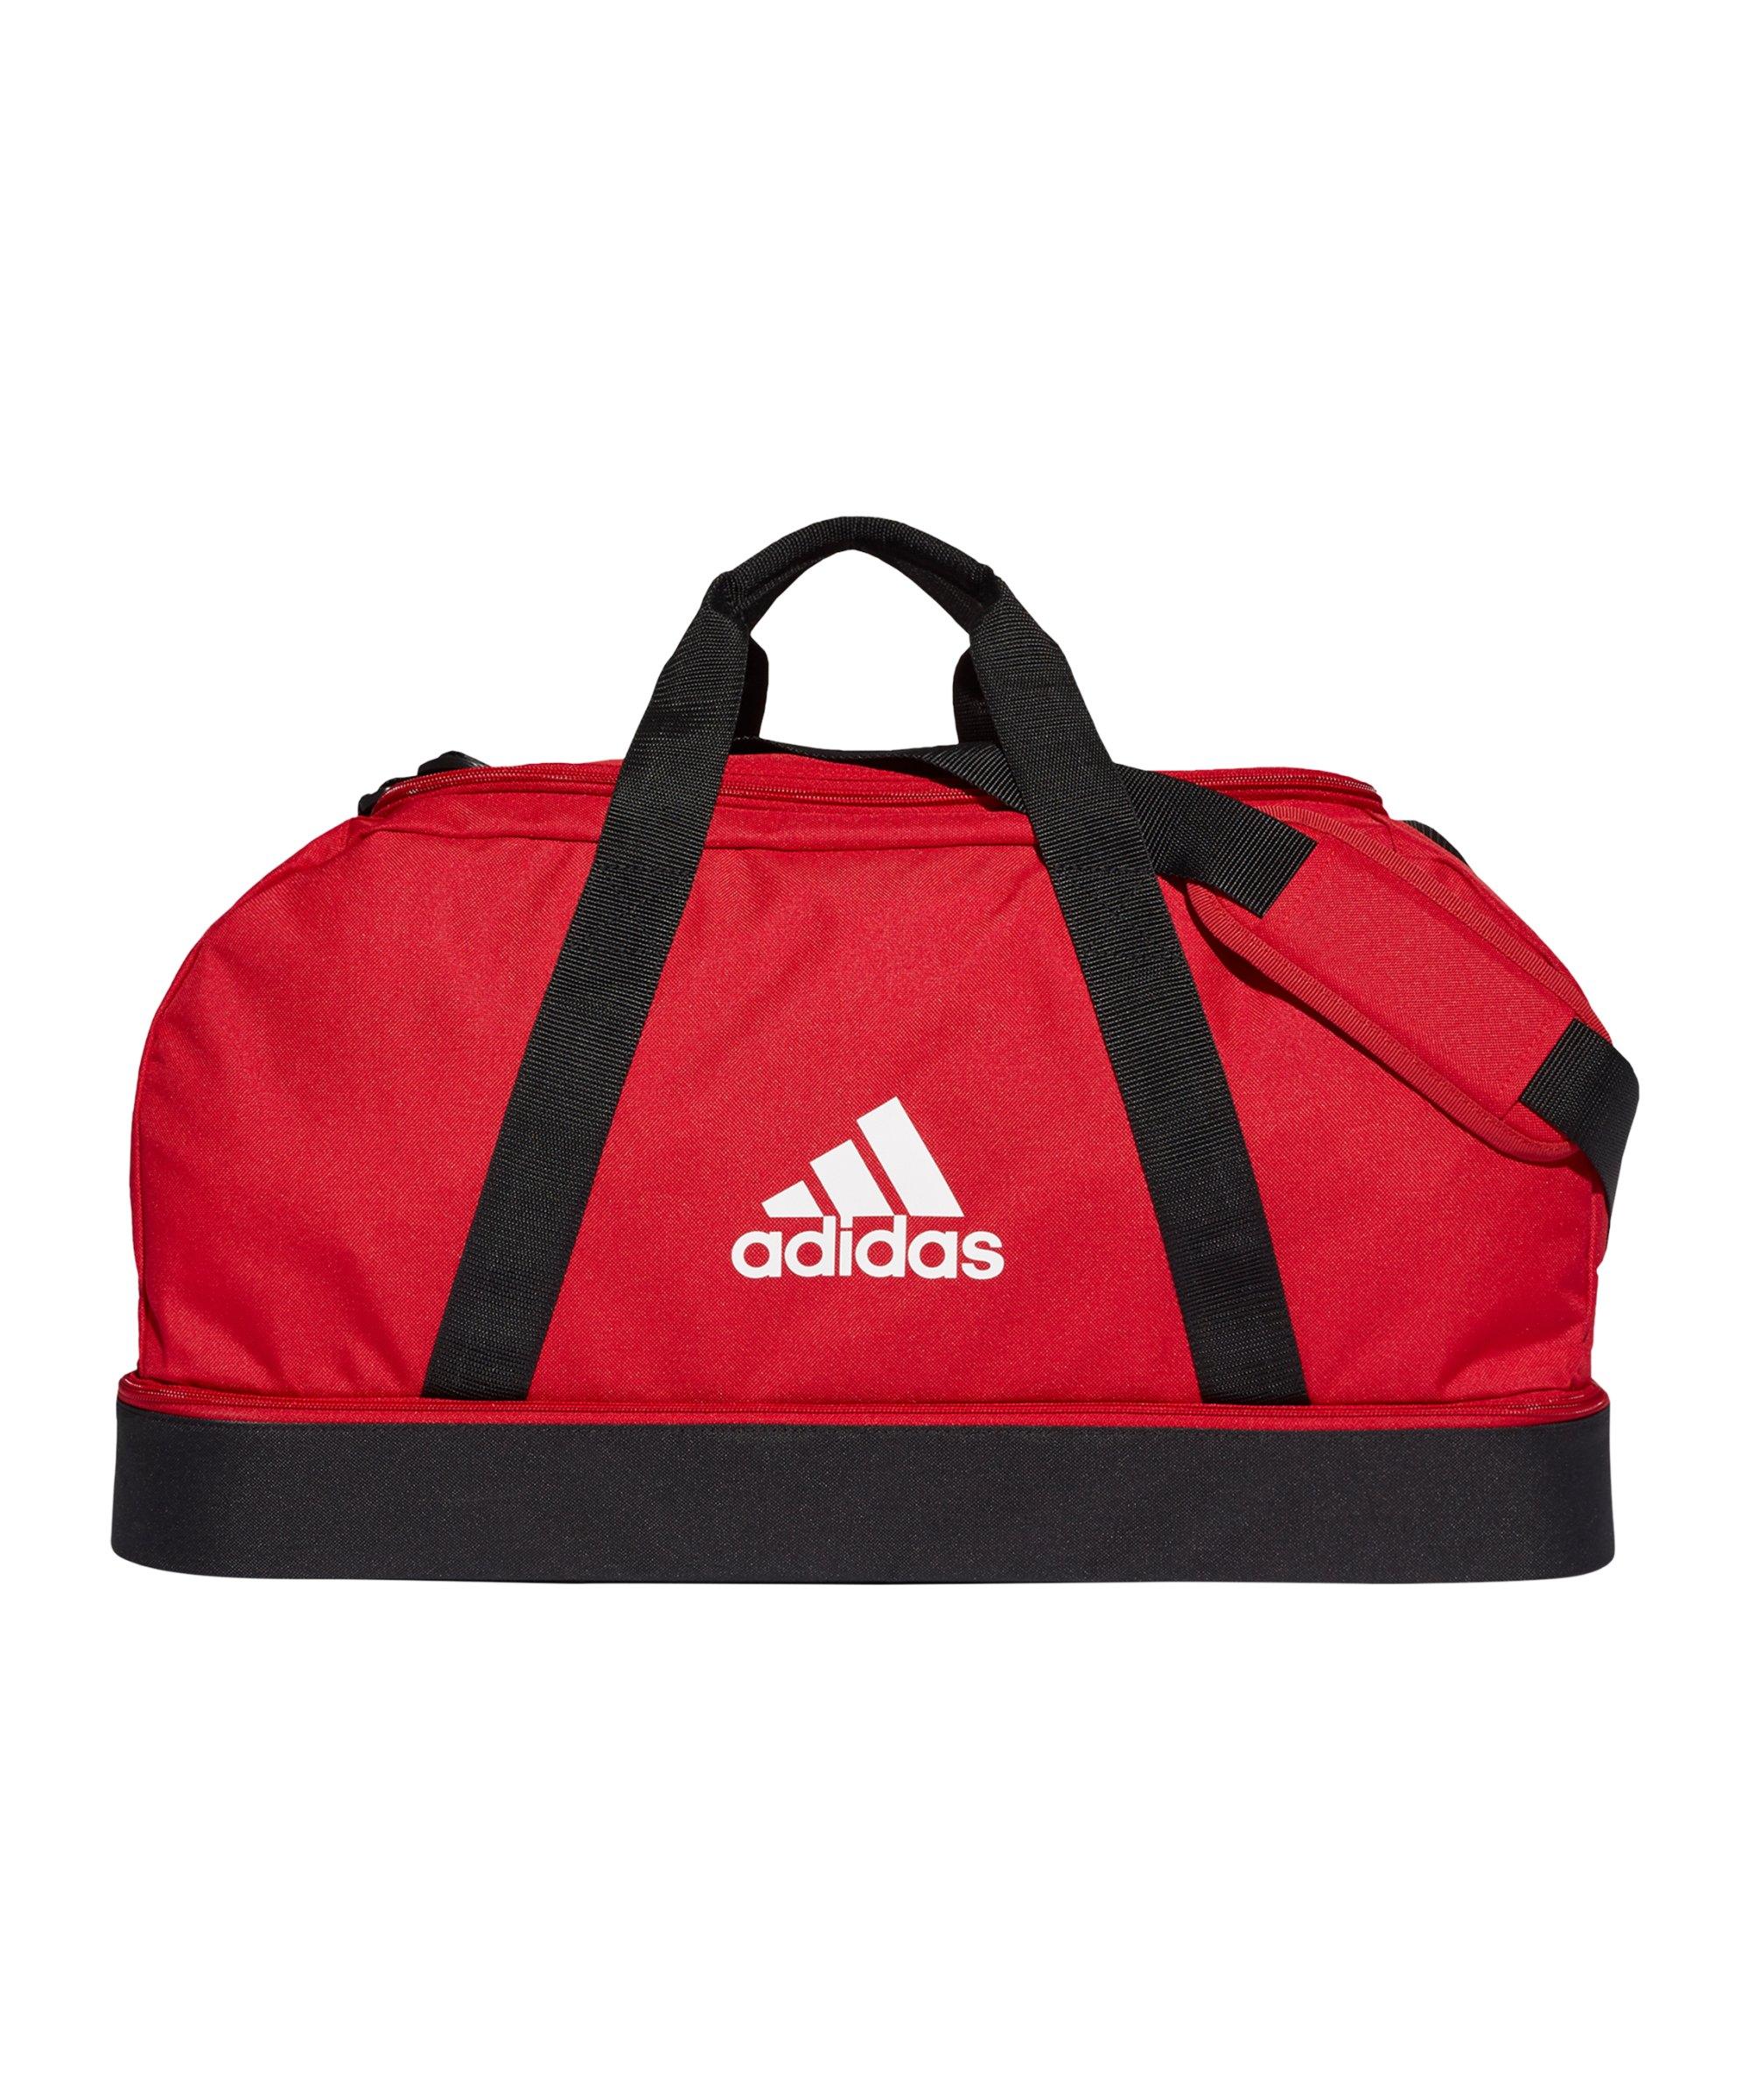 adidas Tiro Duffel Bag Gr. M mit Bodenfach Rot - rot